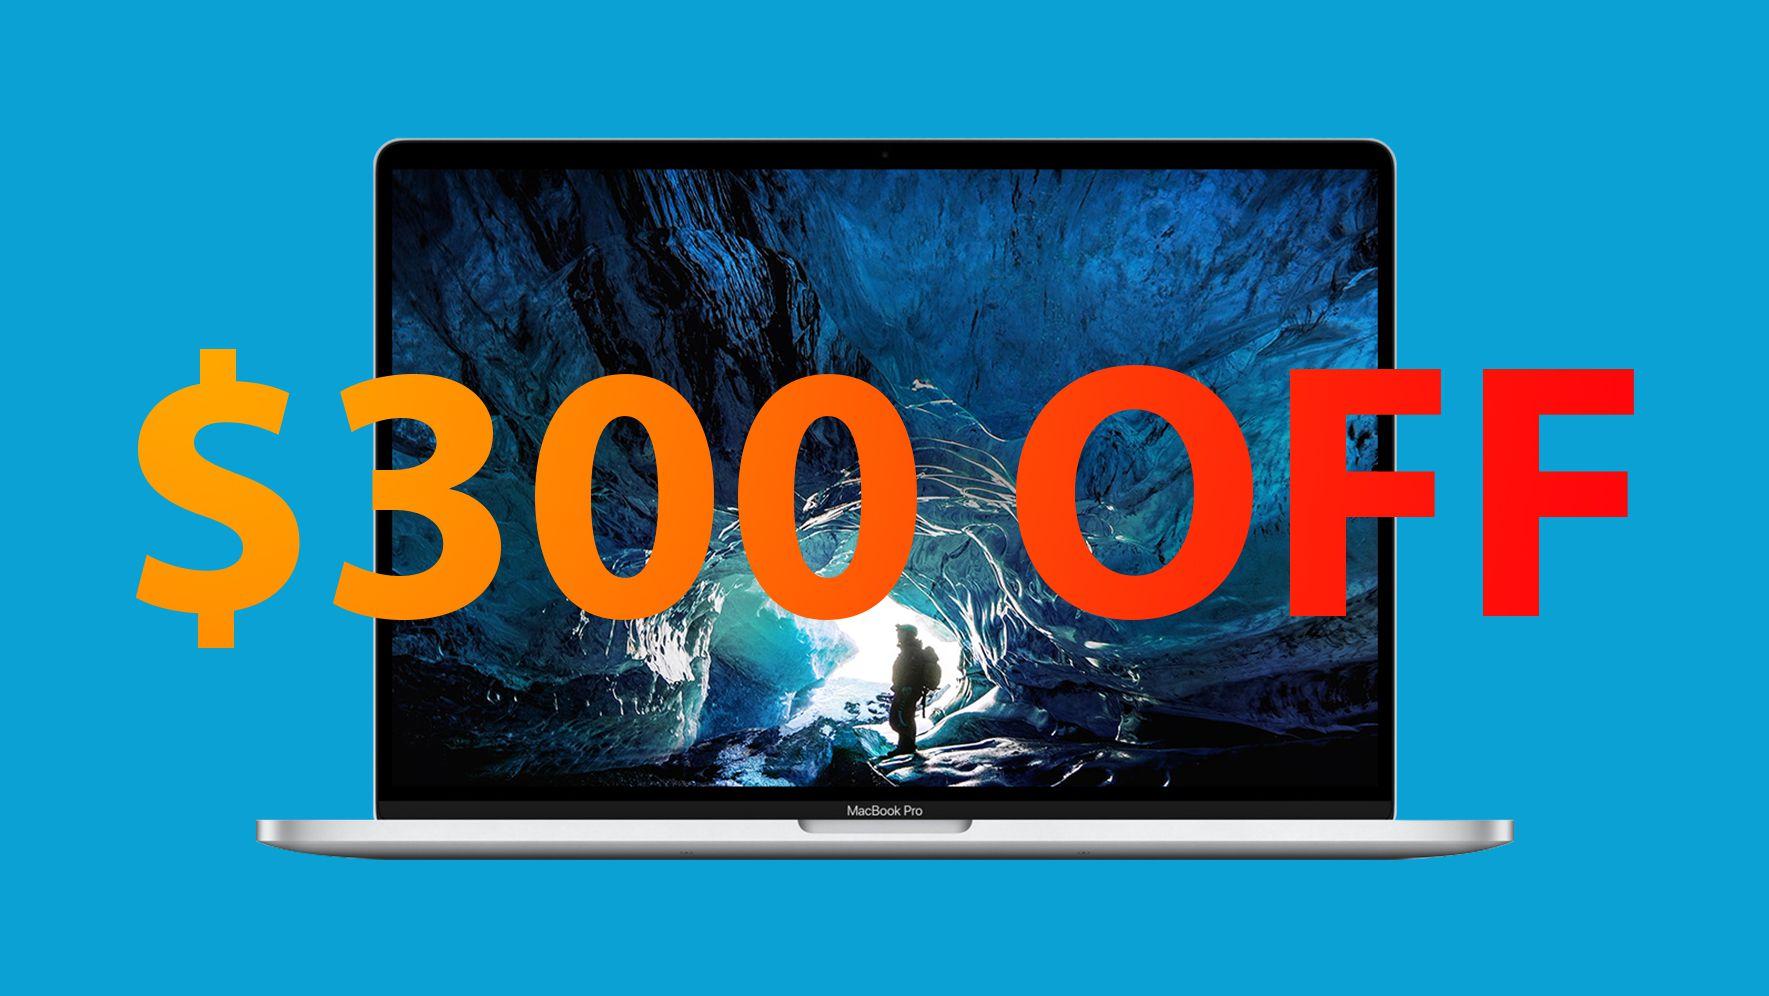 Deals: Amazon Discounts 16-Inch MacBook Pro Models, Starting at $2,099 for 512GB Model - MacRumors